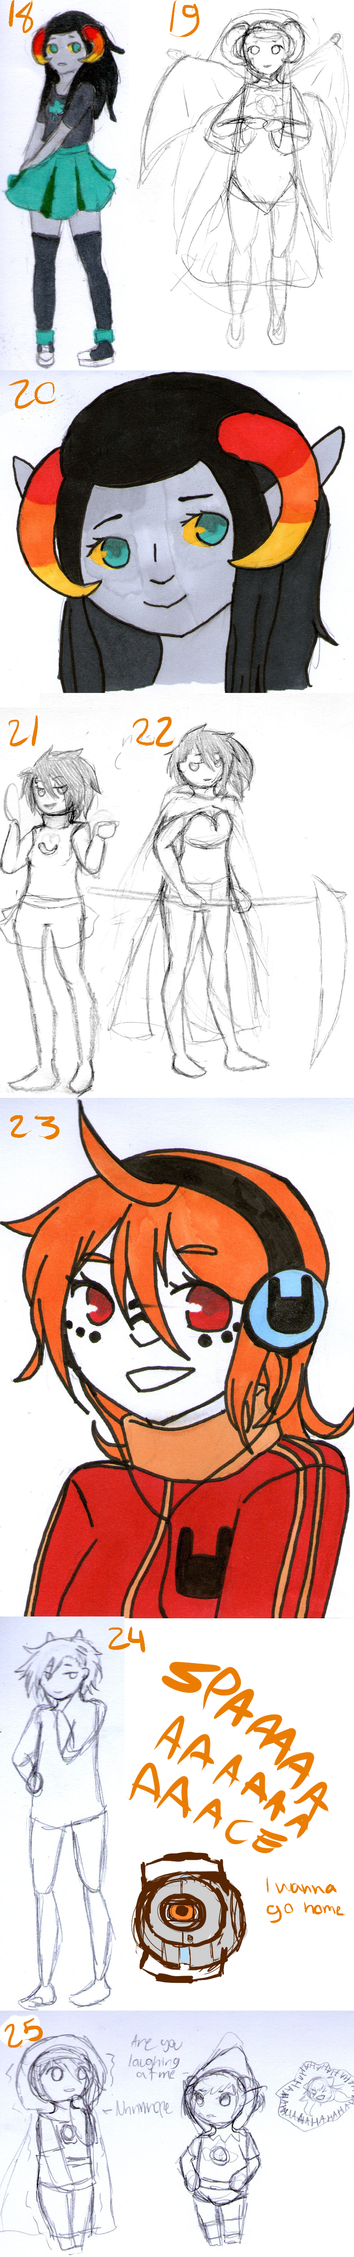 Sketch 3 by Kermakinuski